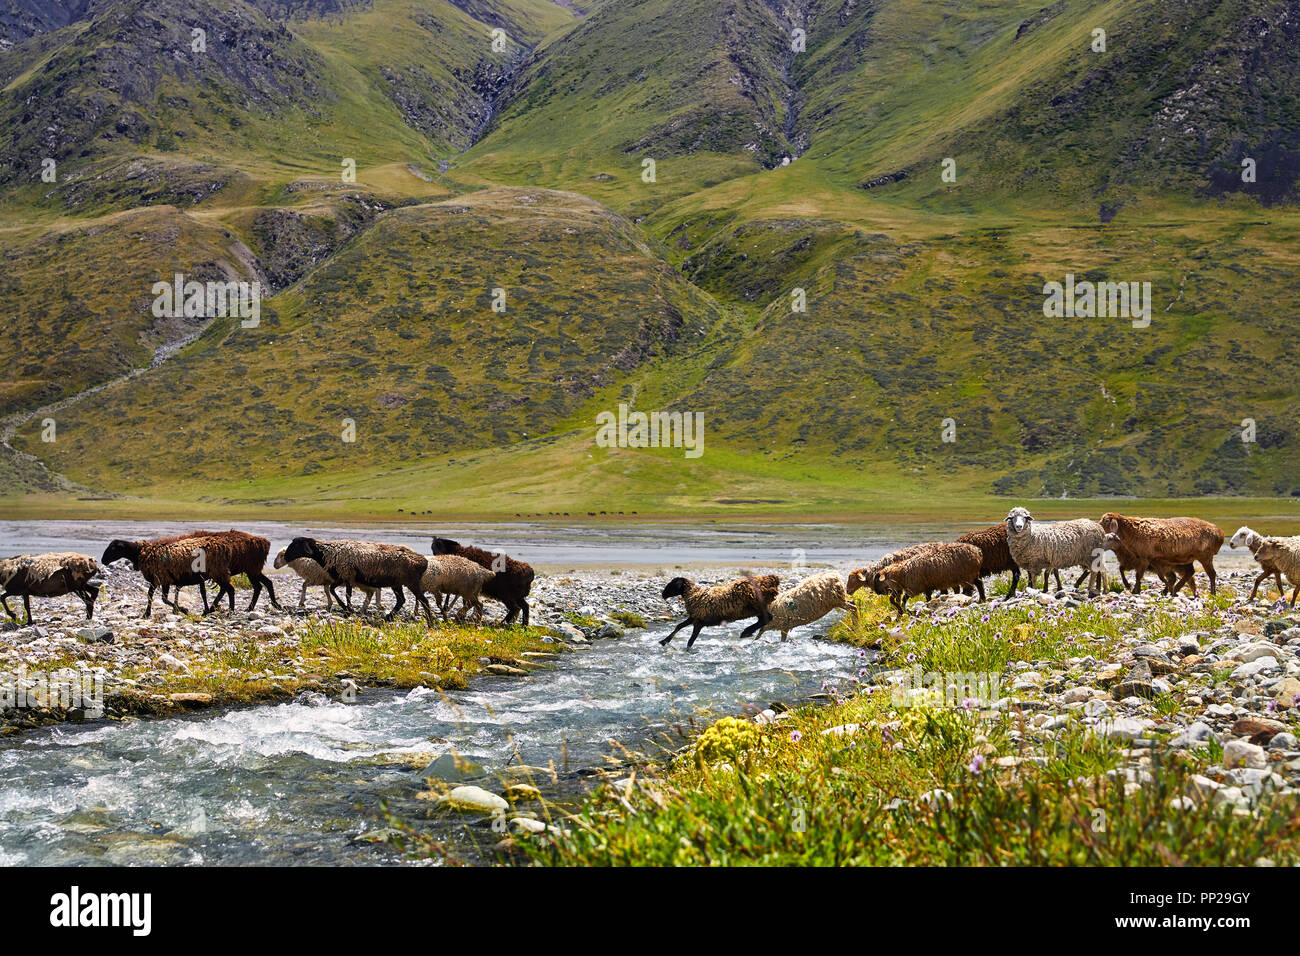 Schafherde über den Fluss im Tal in Kirgisistan und Zentralasien Stockbild